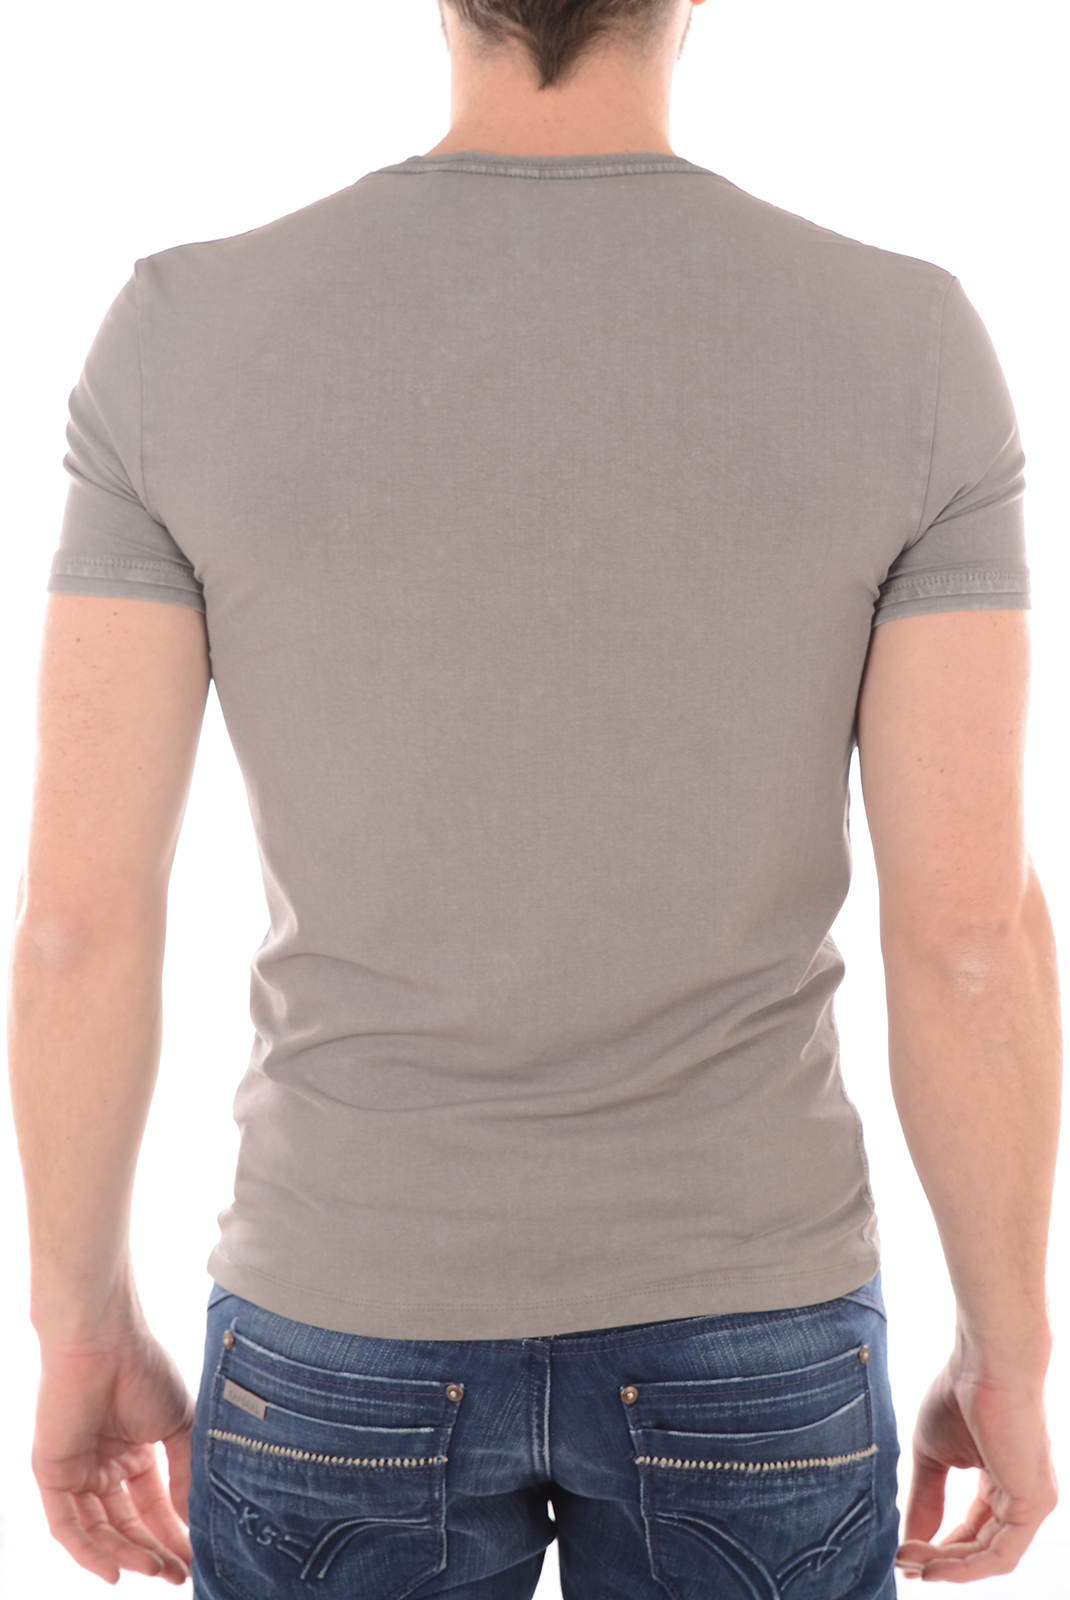 Tee-shirts  Guess jeans M61I04J1311 A947 gris